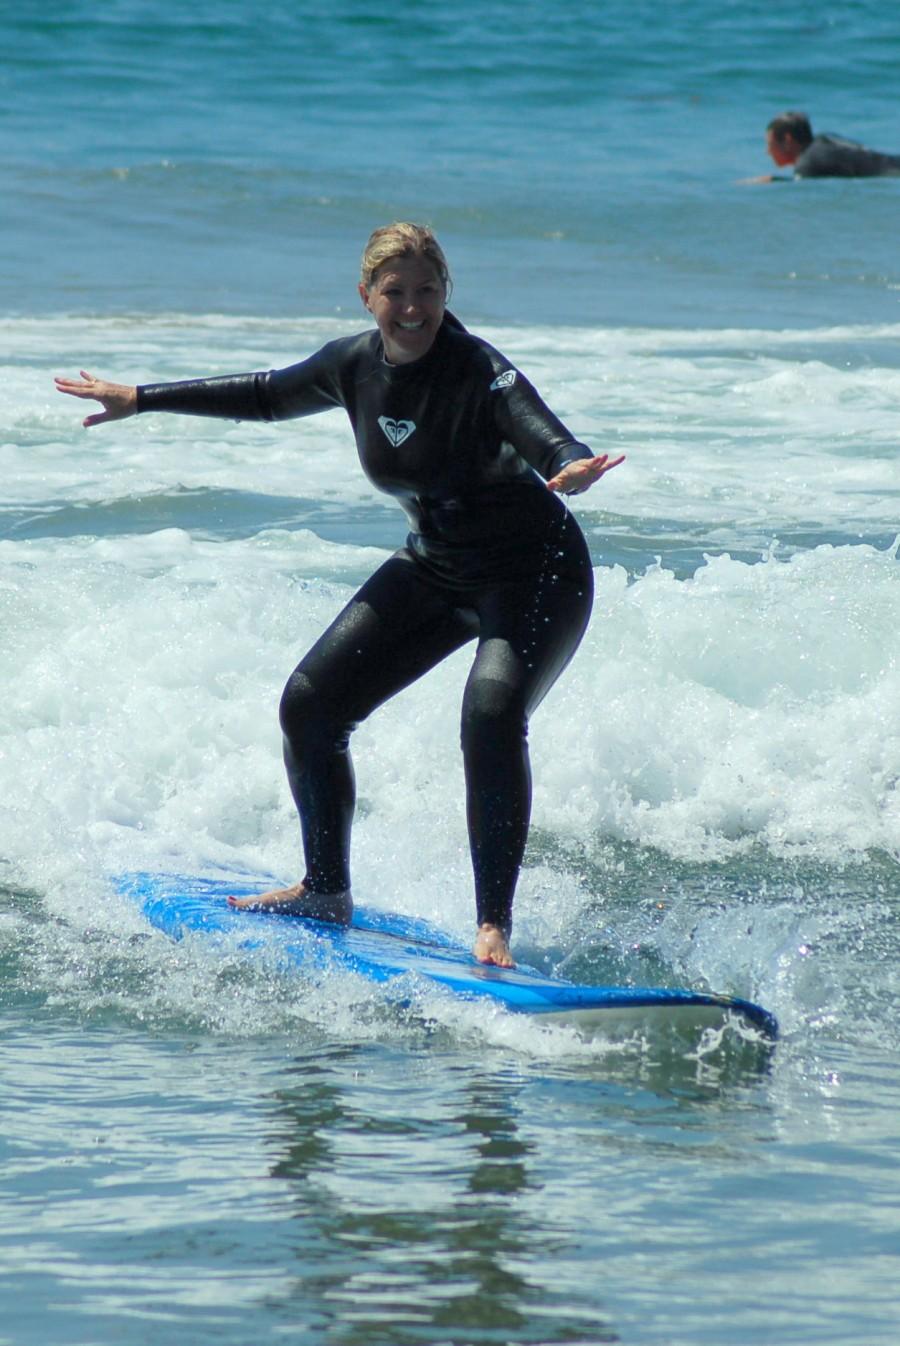 Tera surfing